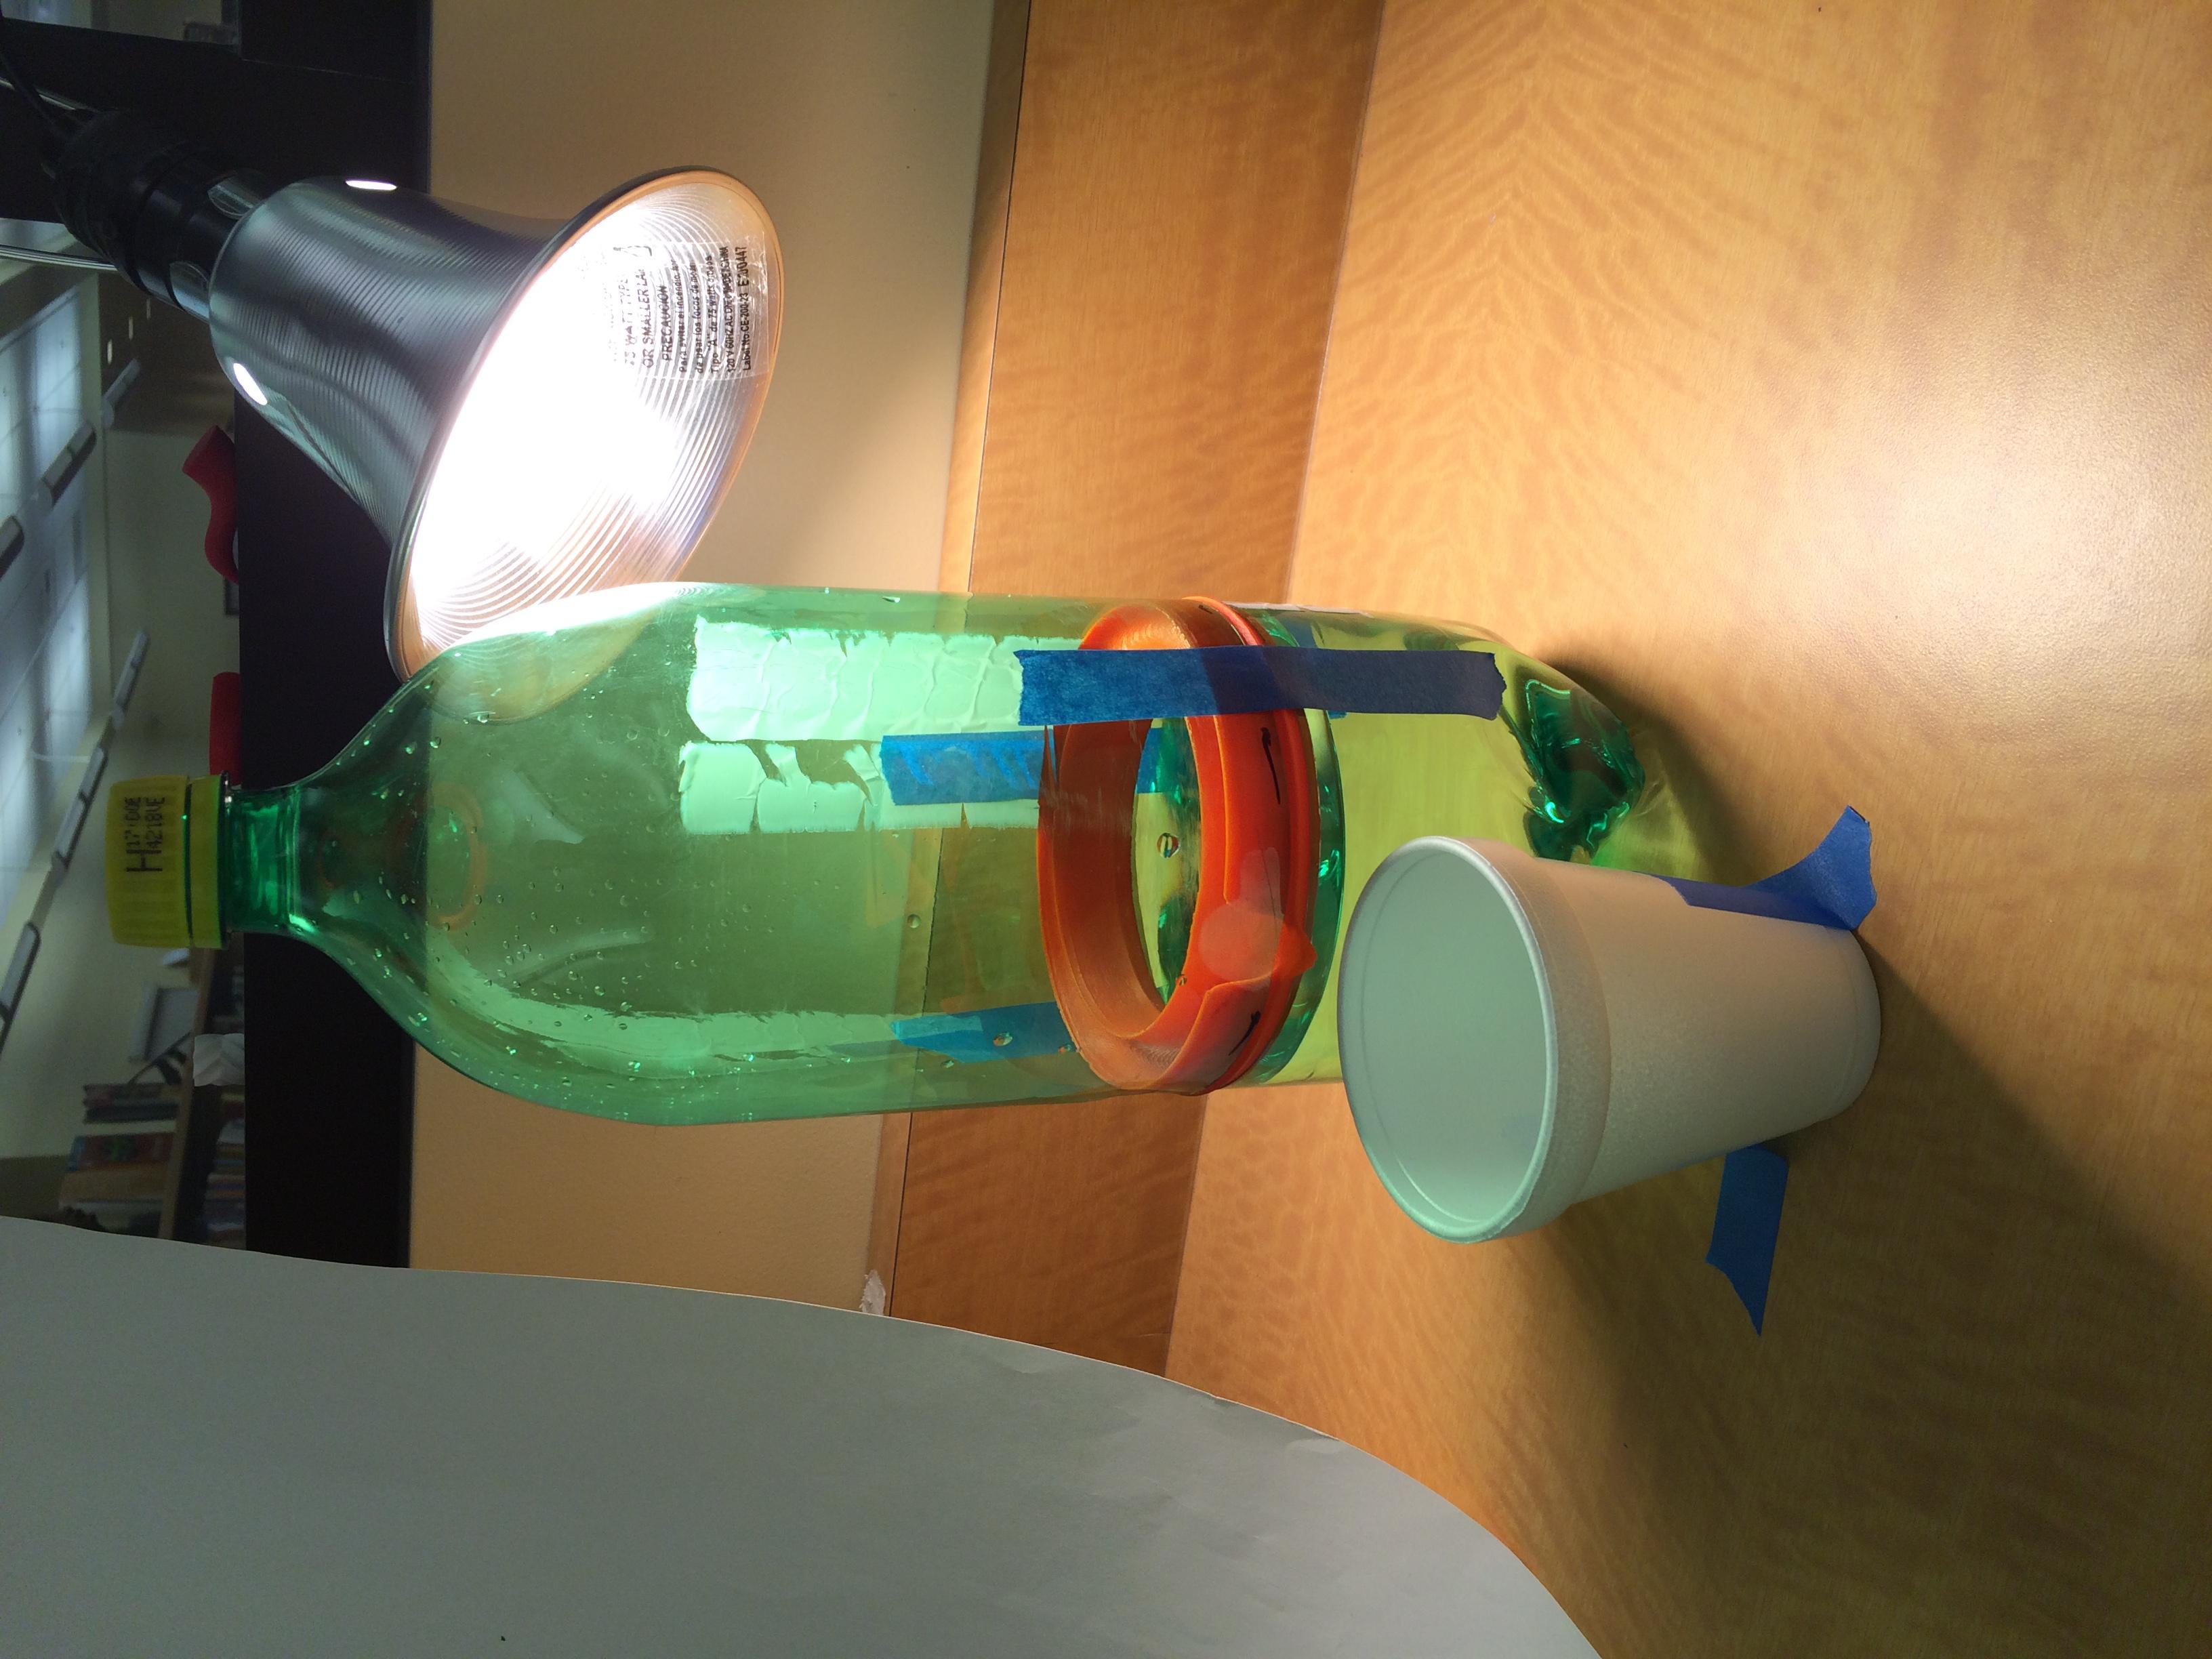 Prototype assembled in 2 liter bottle.